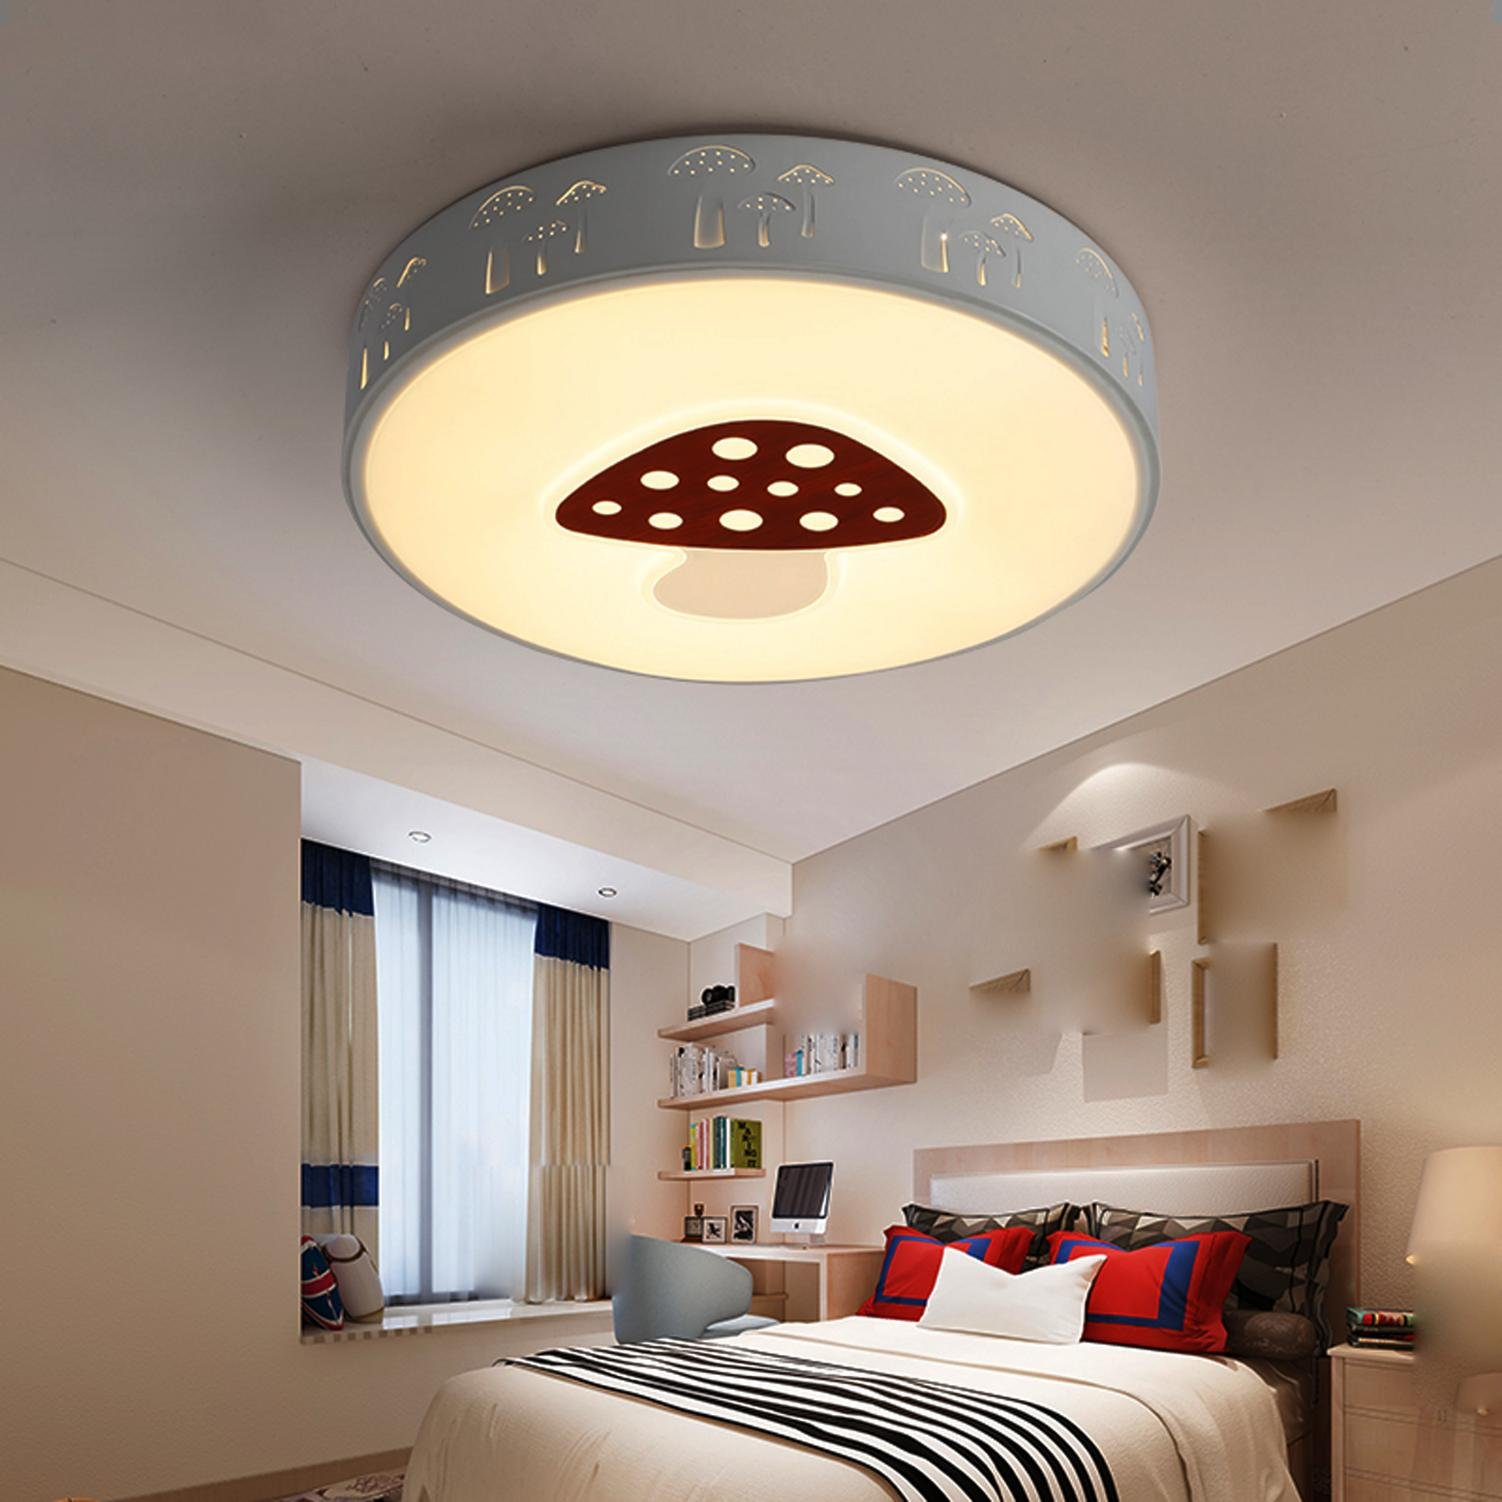 Maniny Children Room Ceiling Lamp Boy LED Creative Round Creative Ceiling Light Bedroom Chandelier Girl Mushroom Room Cartoon Ceiling